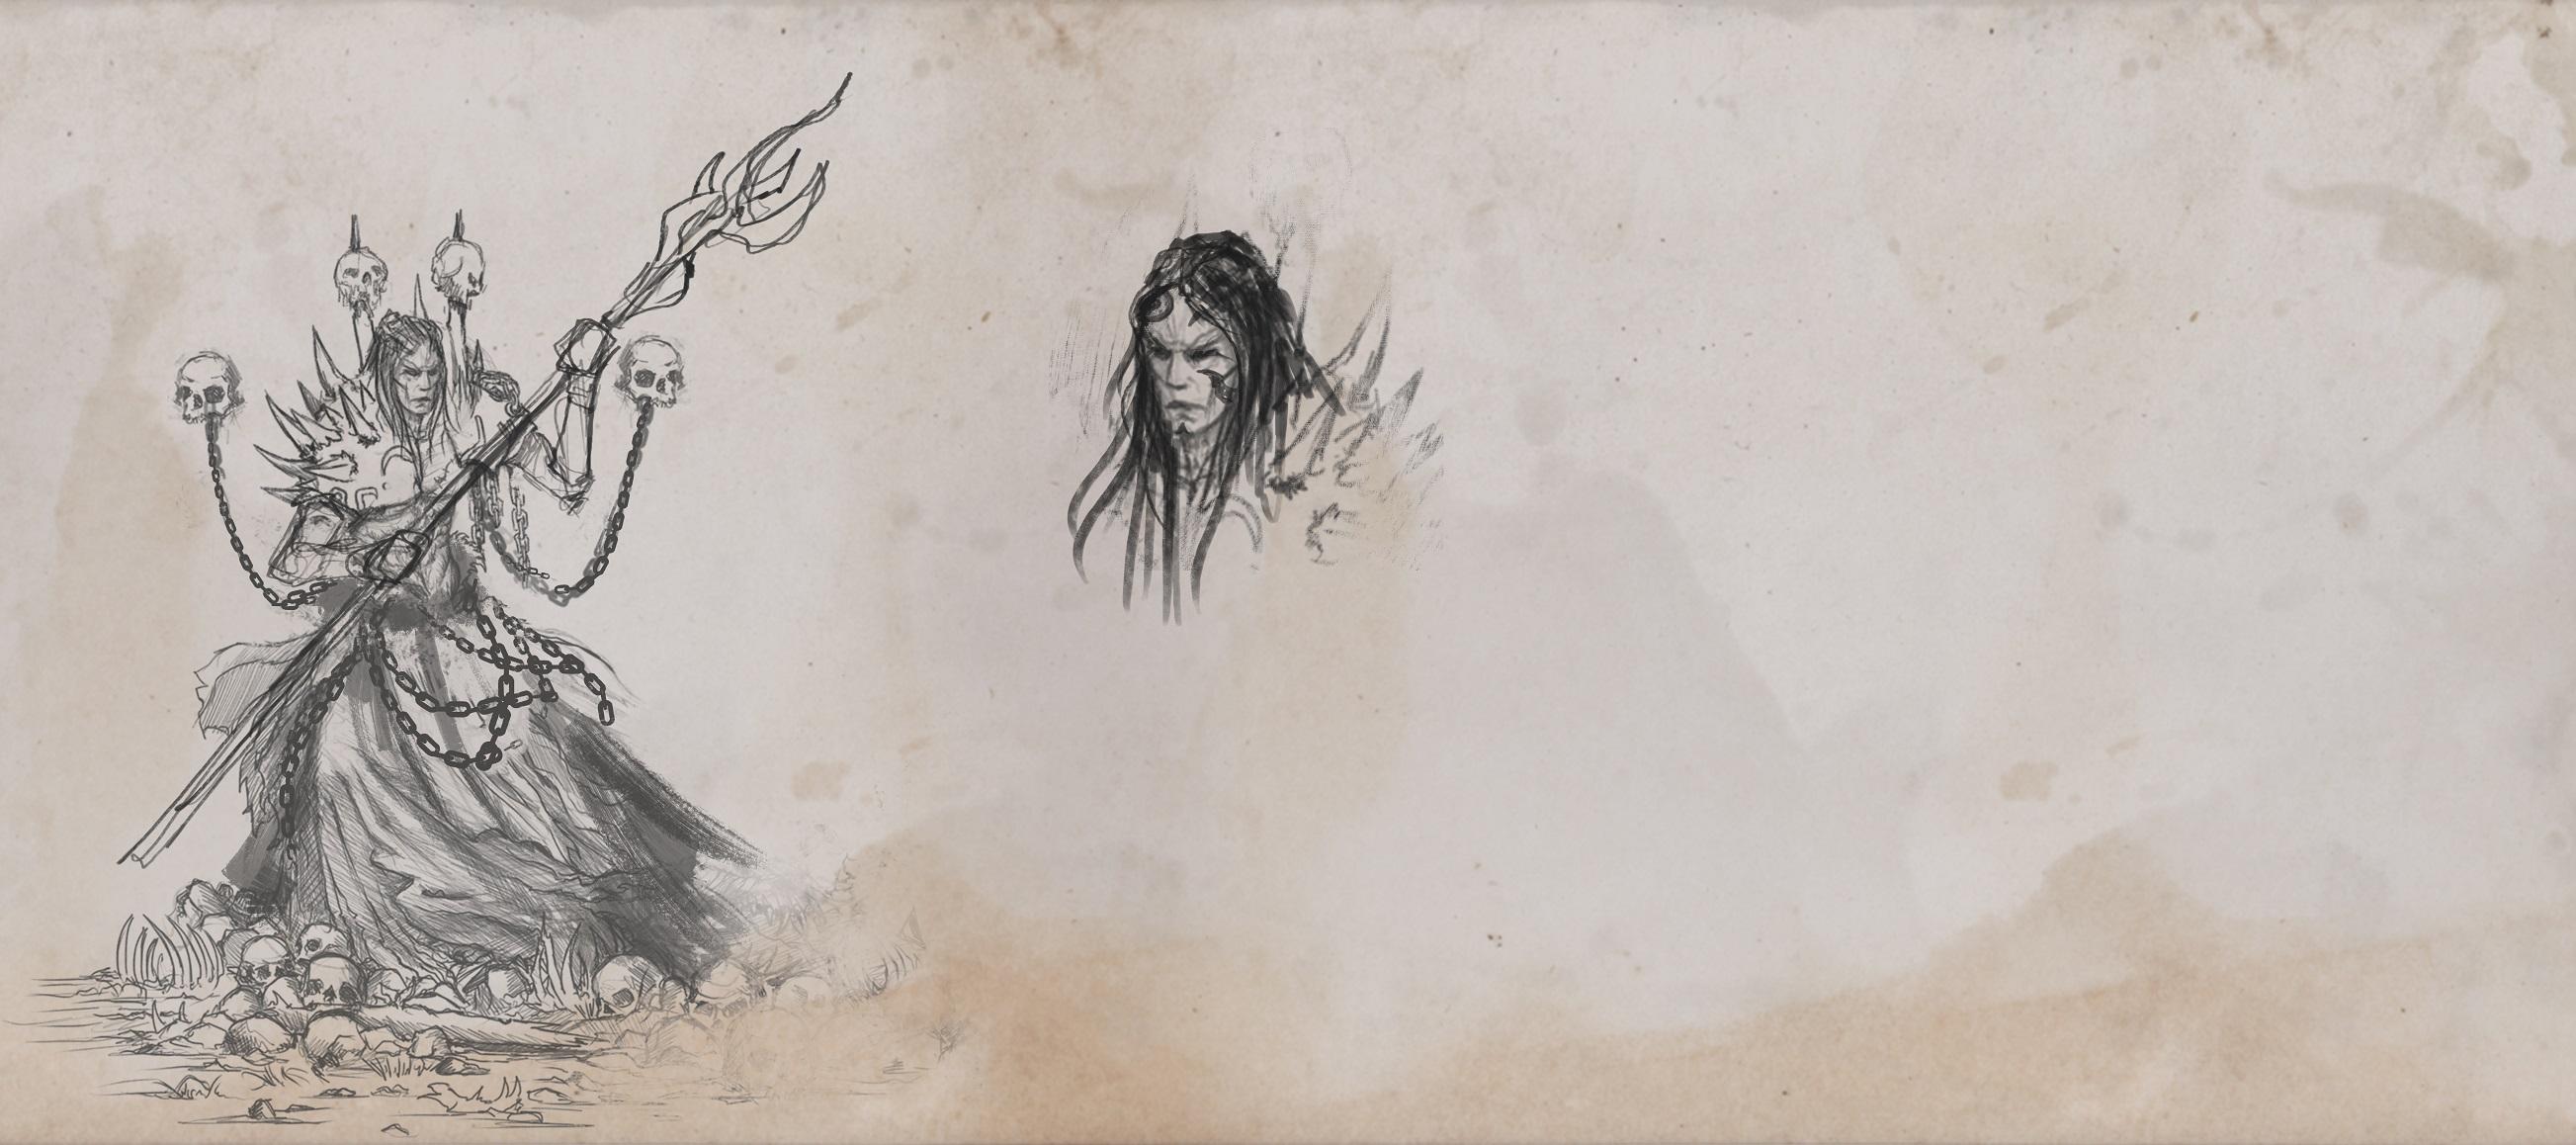 ARNHEIM CONCEPT ART Characters 3